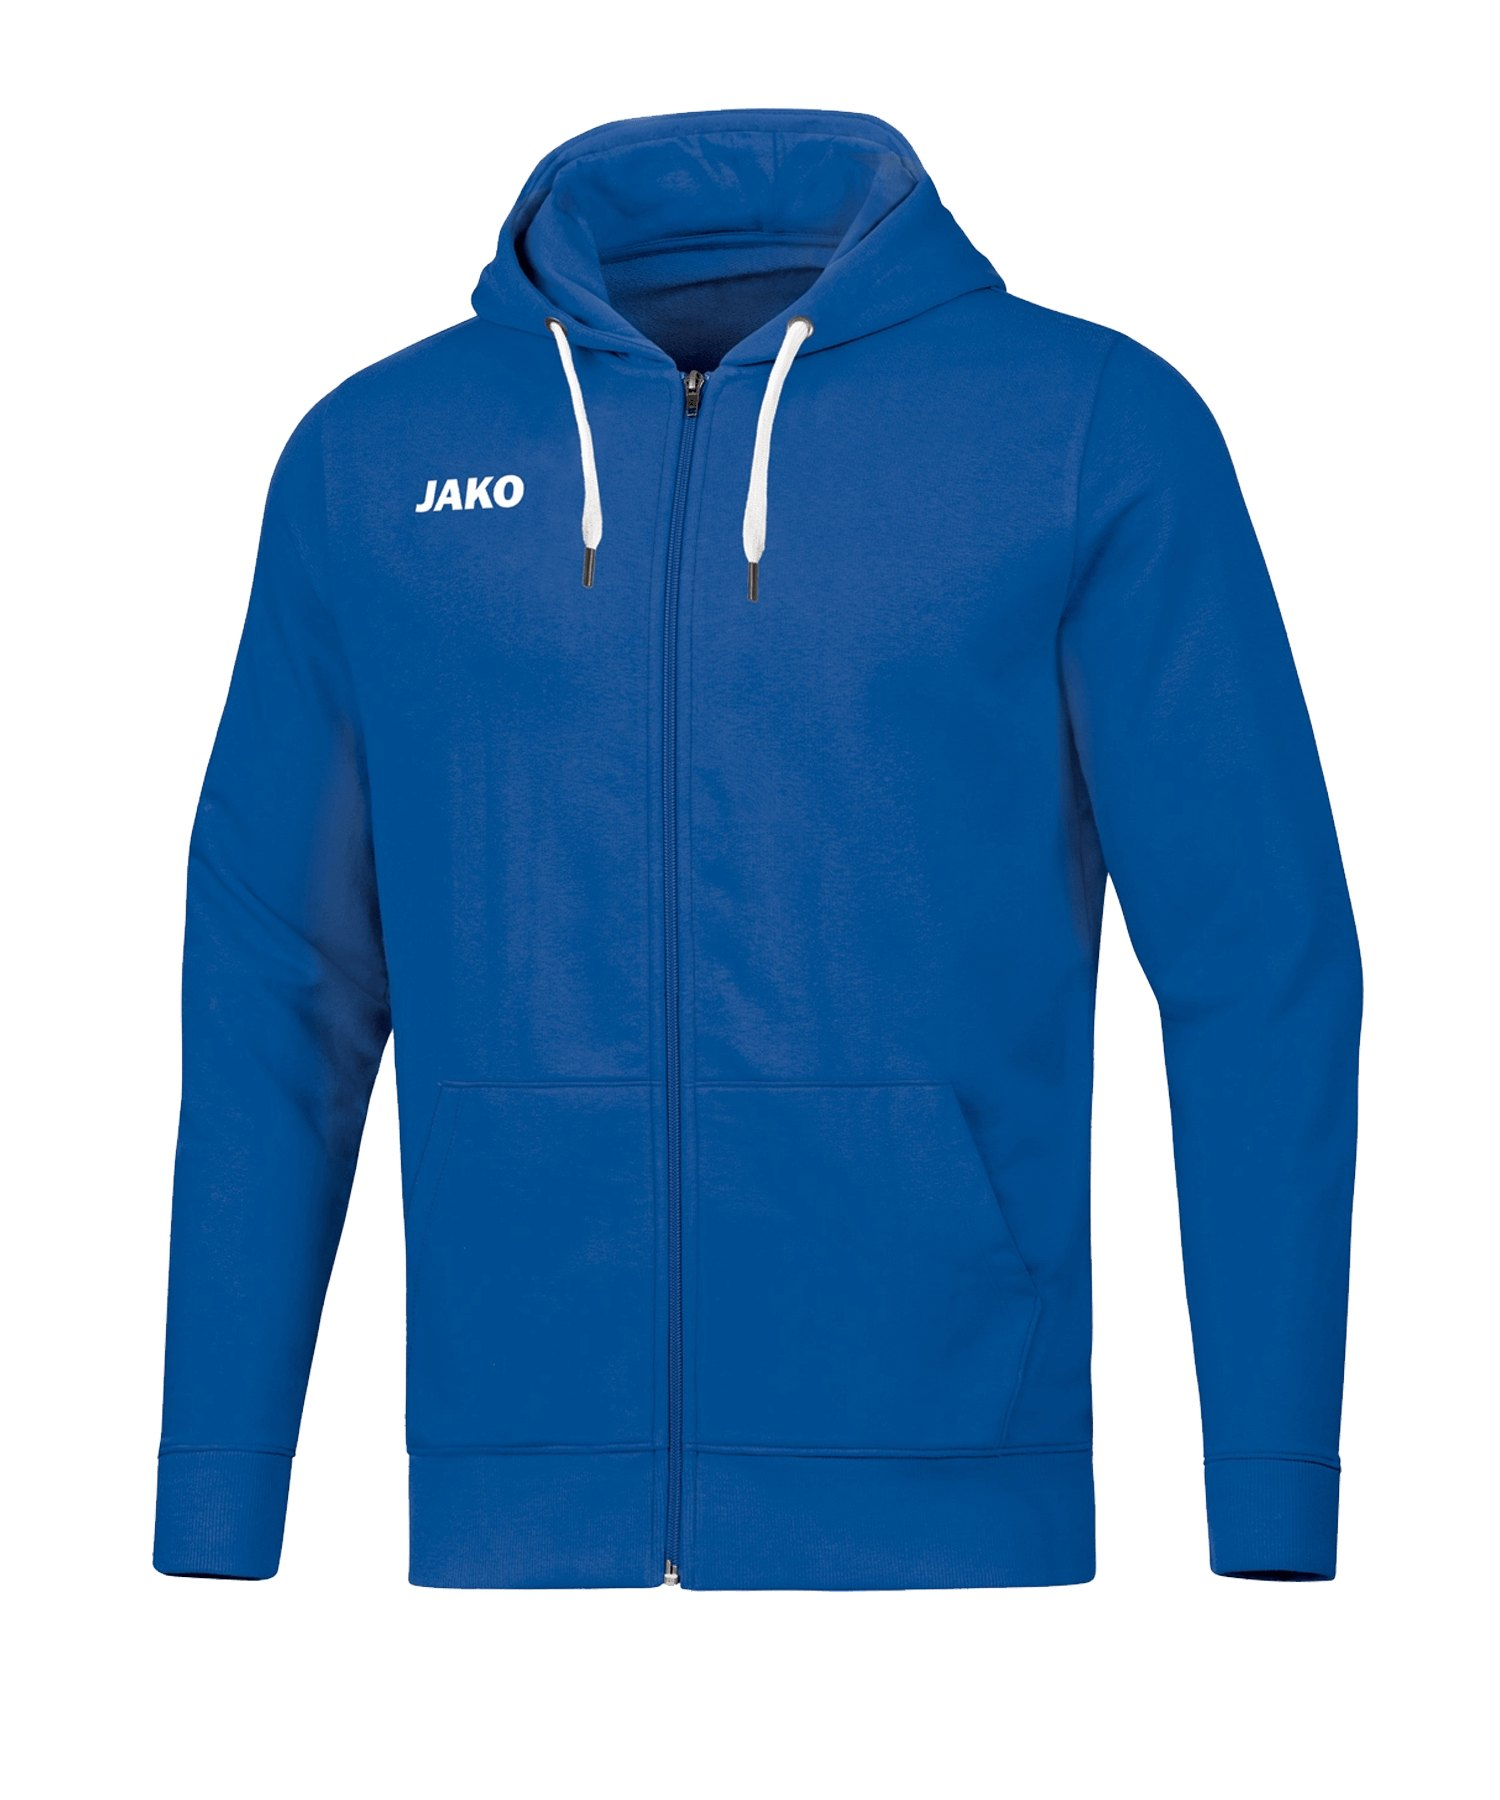 JAKO Base Kapuzenjacke Damen Blau F04 - blau